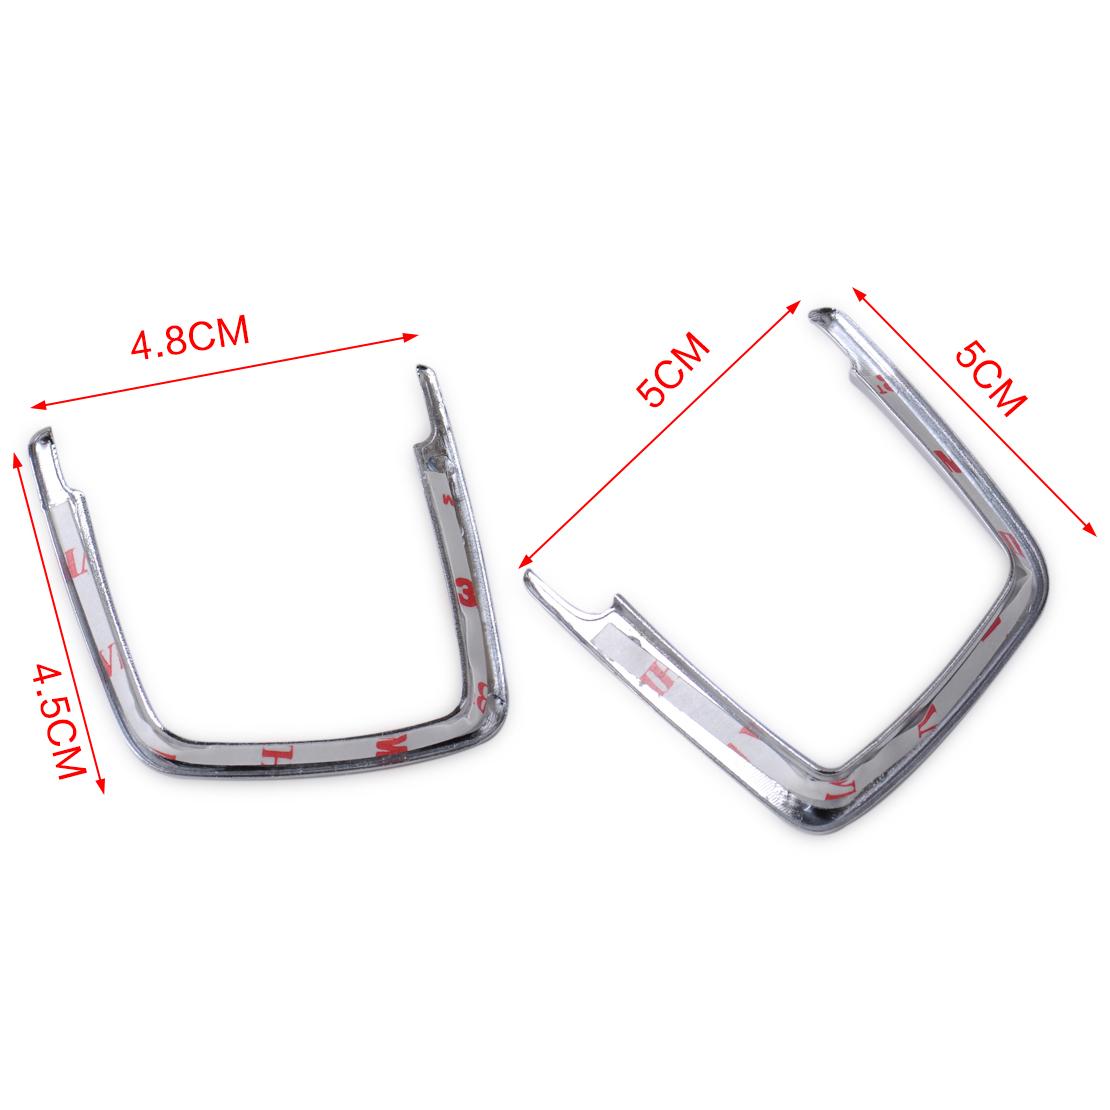 Chrome Headlight Switch Trim Cover For Bmw F30 F31 F32 F34